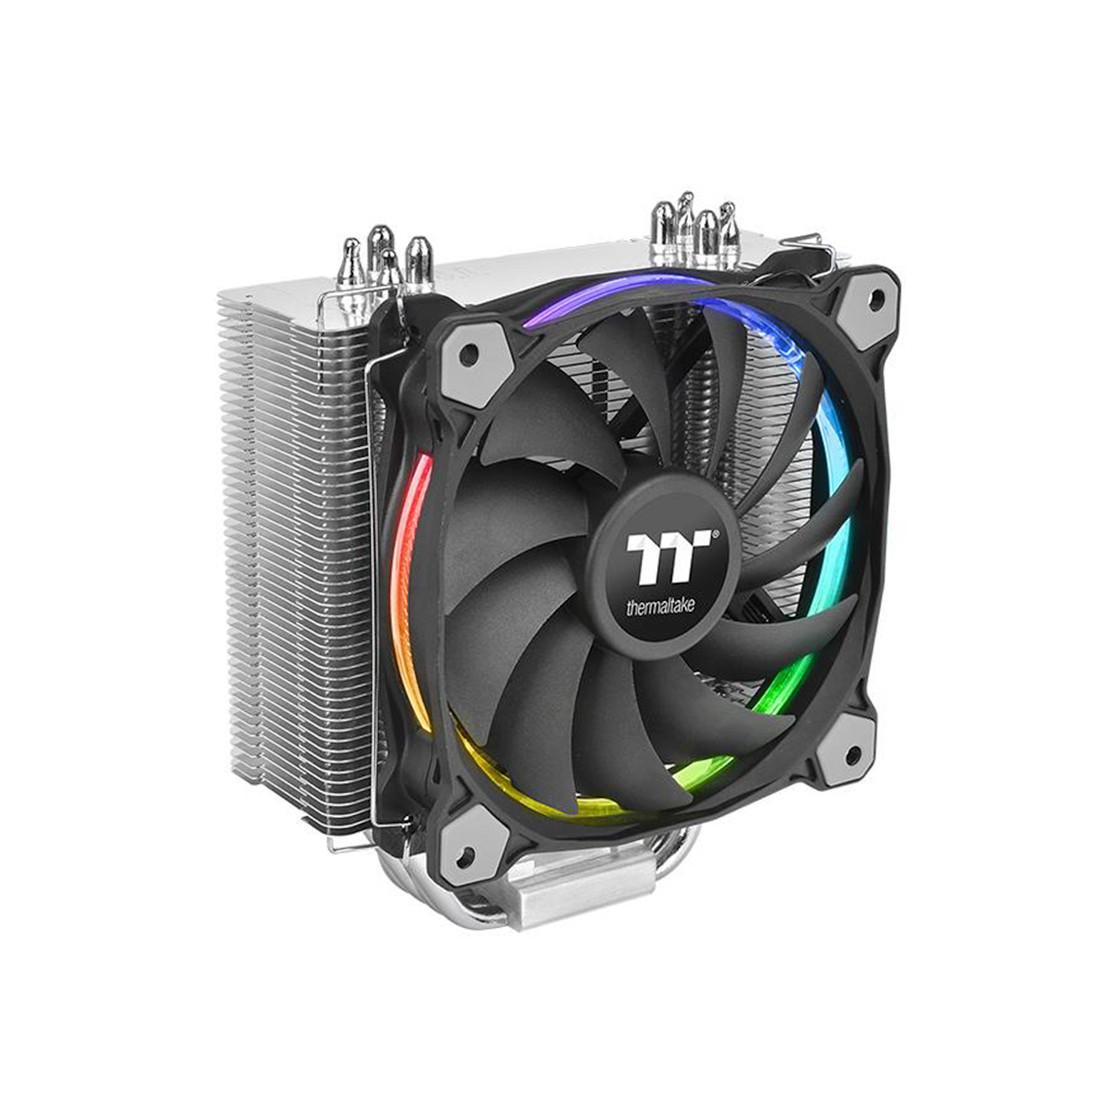 Кулер для процессора Thermaltake Riing Silent 12 RGB Sync